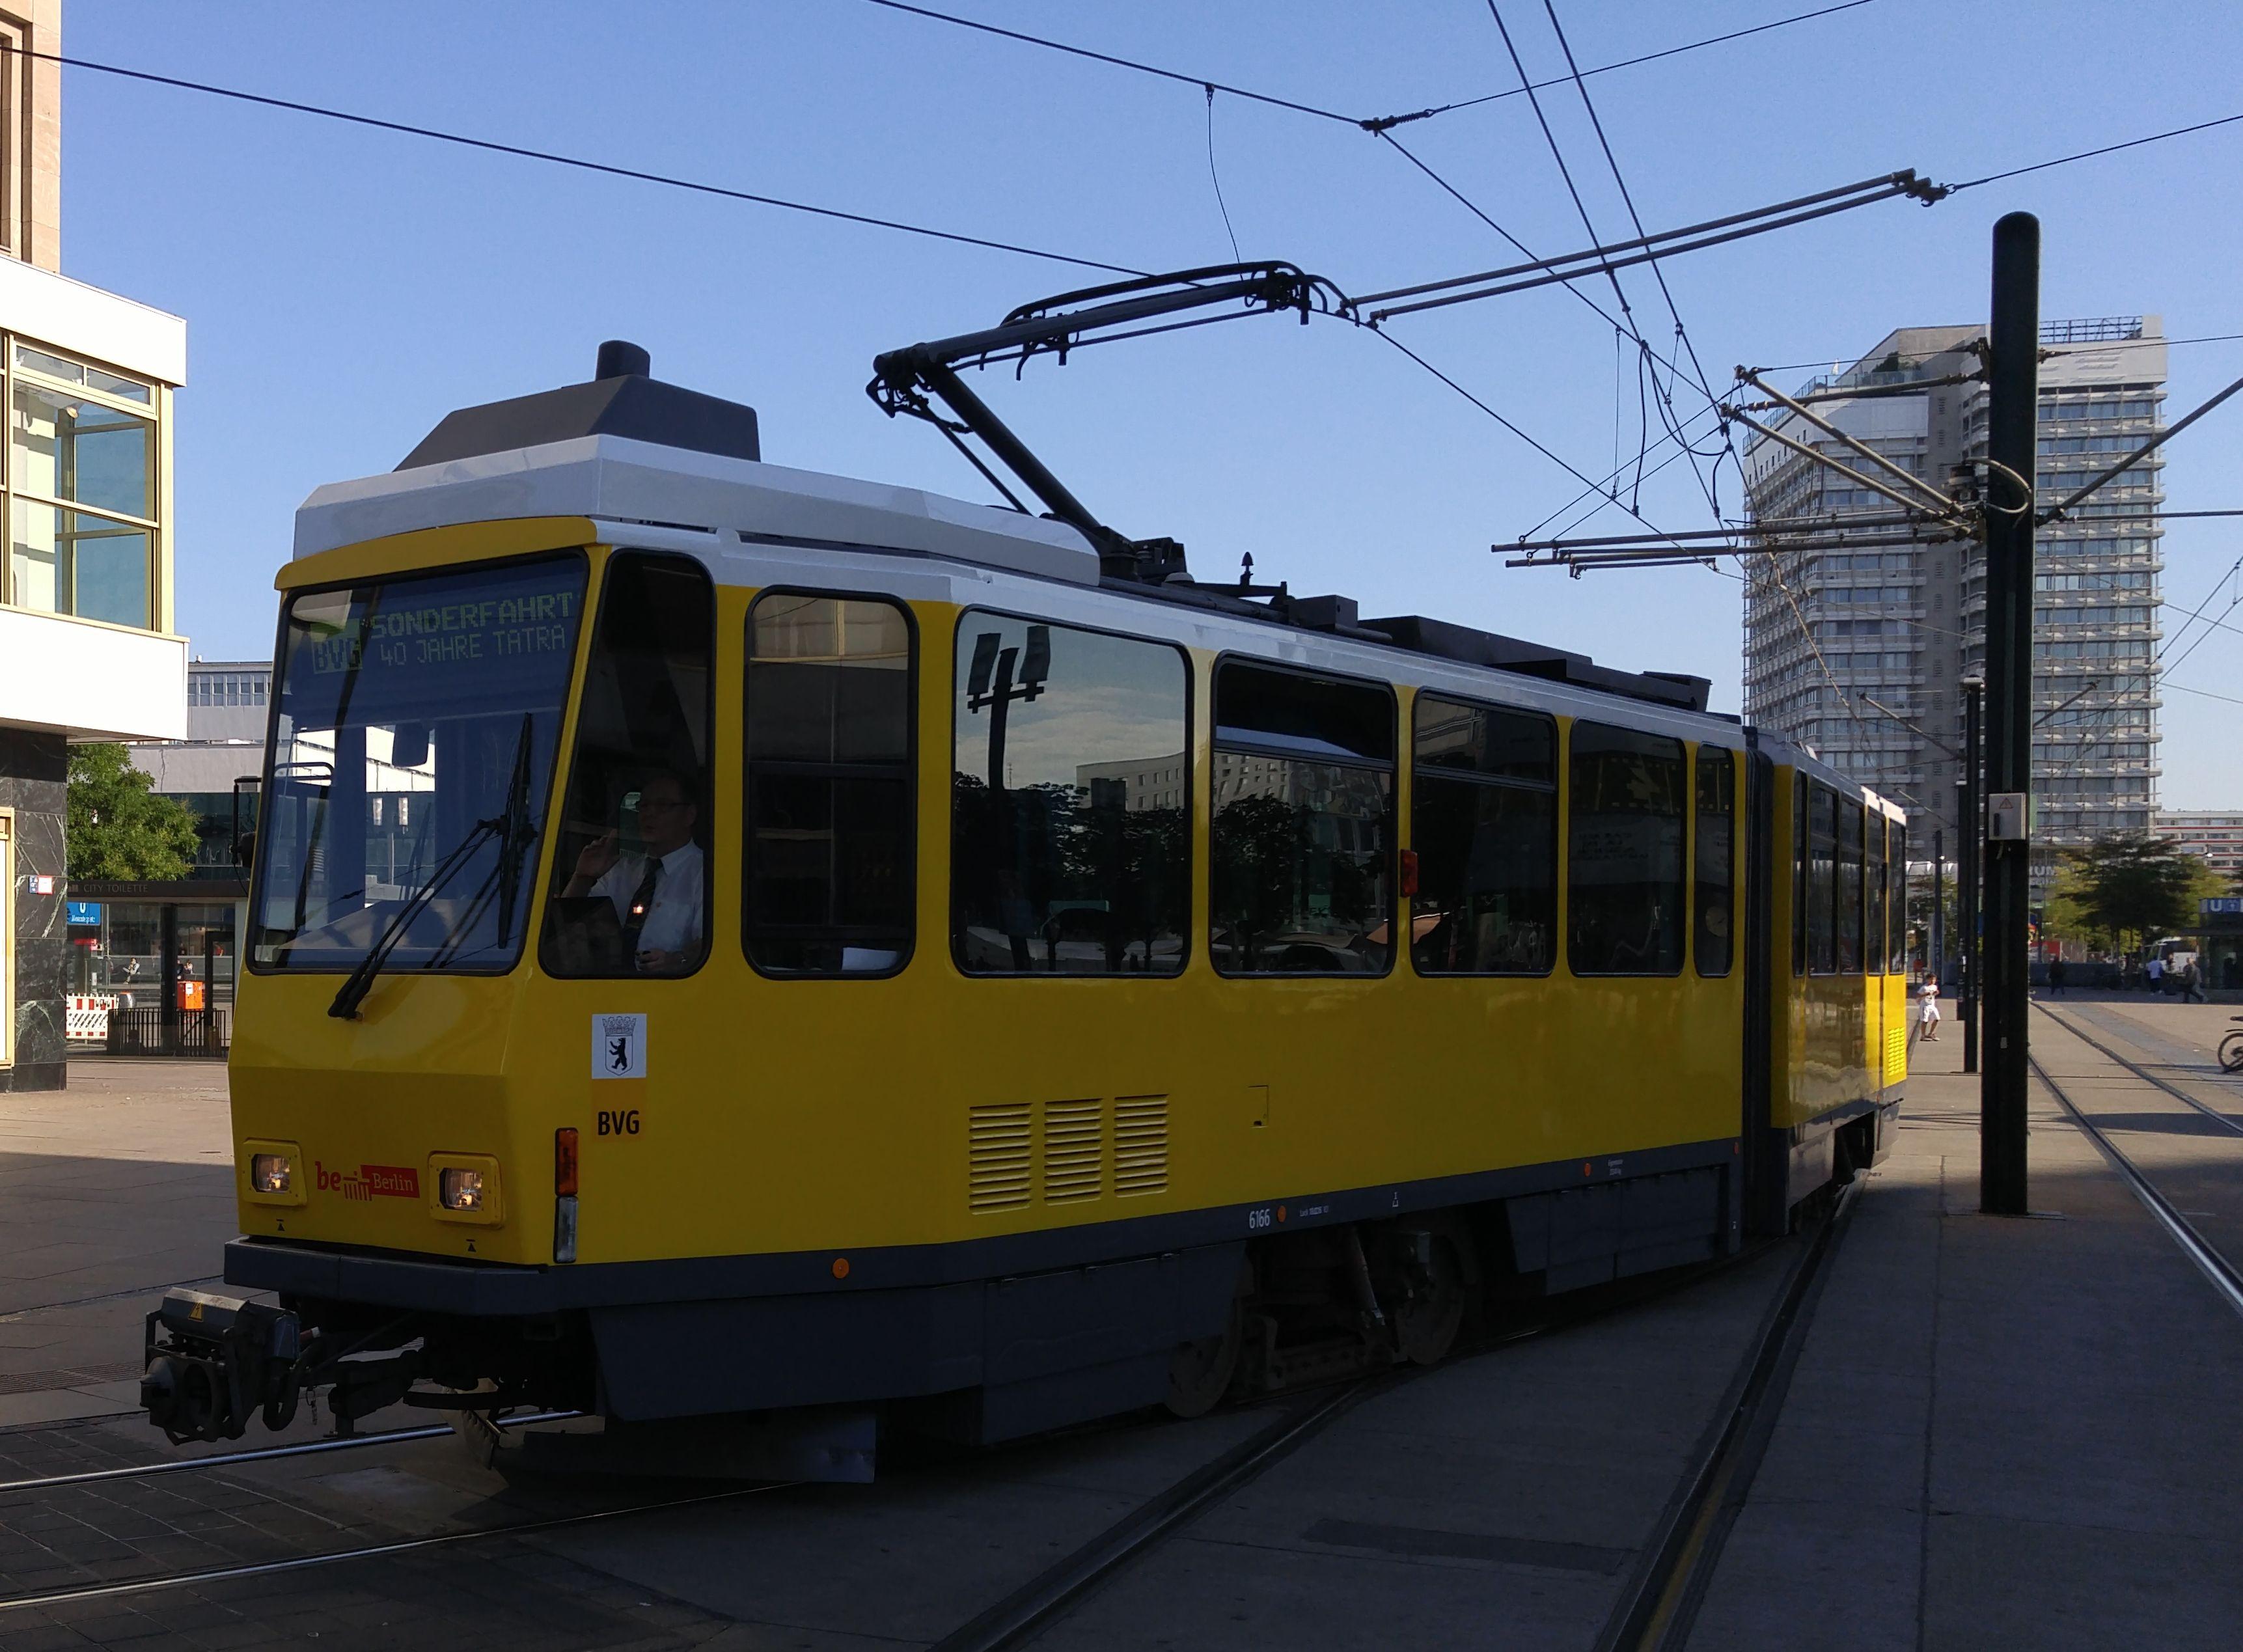 Foto: Straßenbahn 6166, Typ Tatra KT4D, Alexanderplatz, 2016